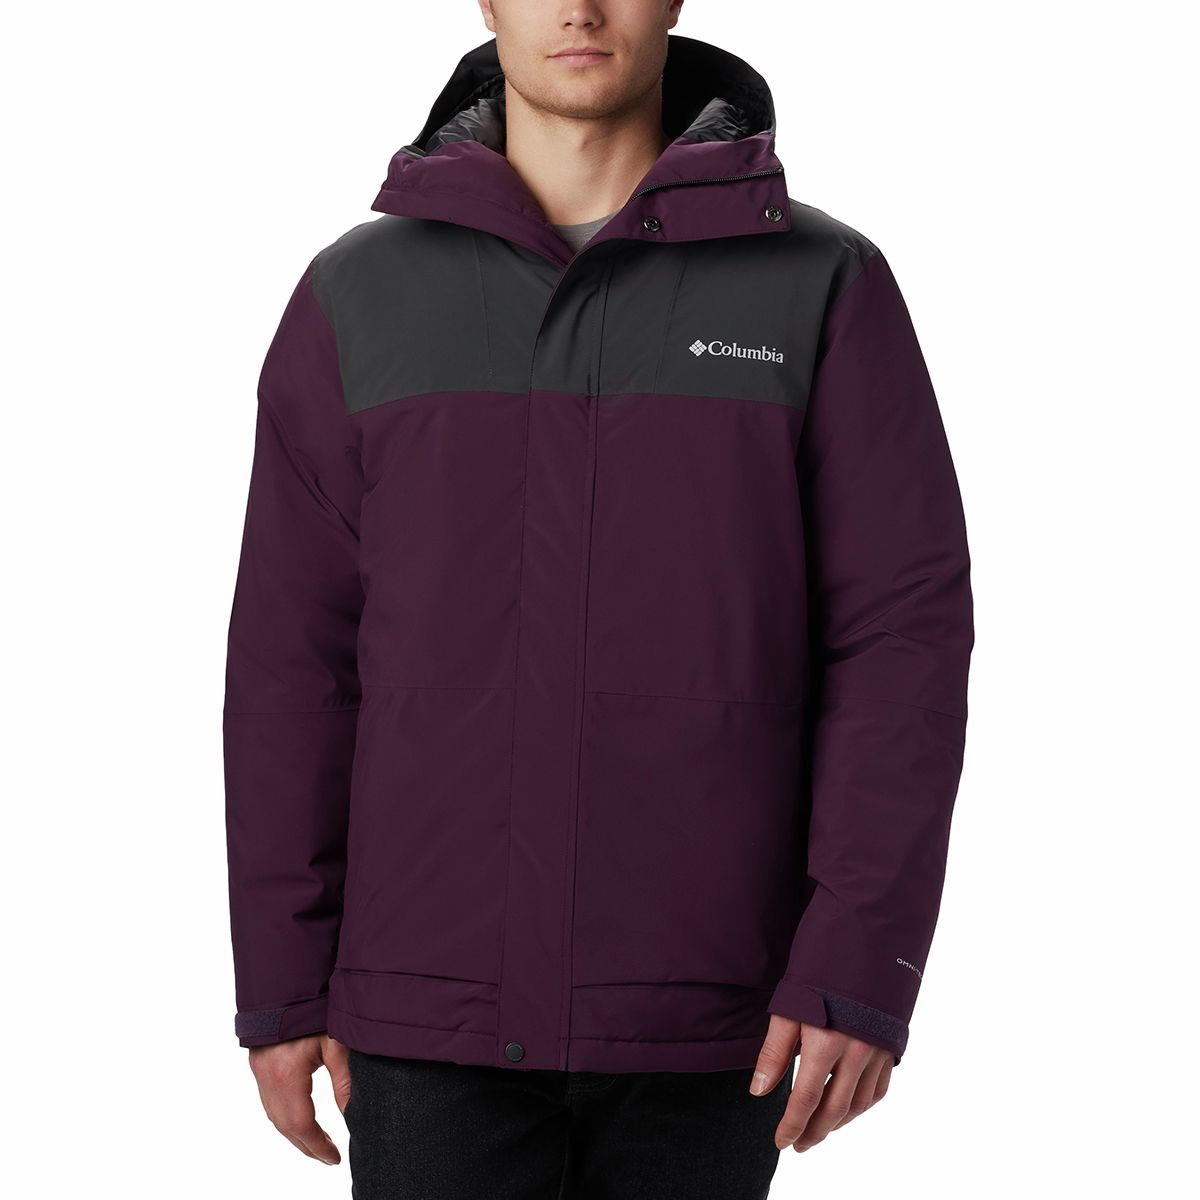 Horizon Explorer Insulated Jacket - Men